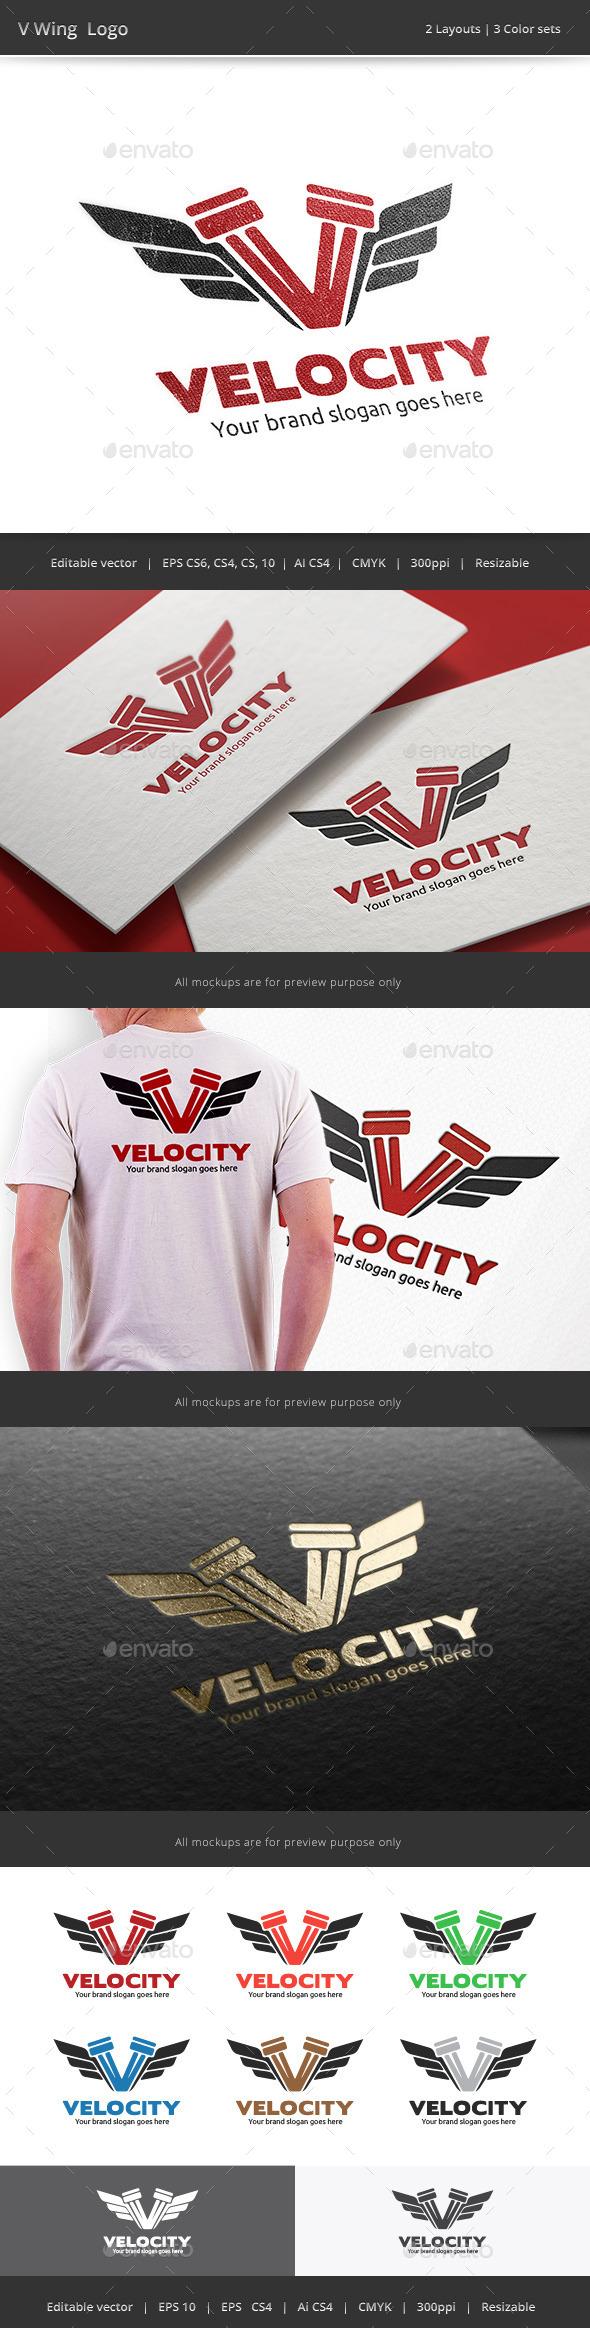 V Wing Logo - Vector Abstract